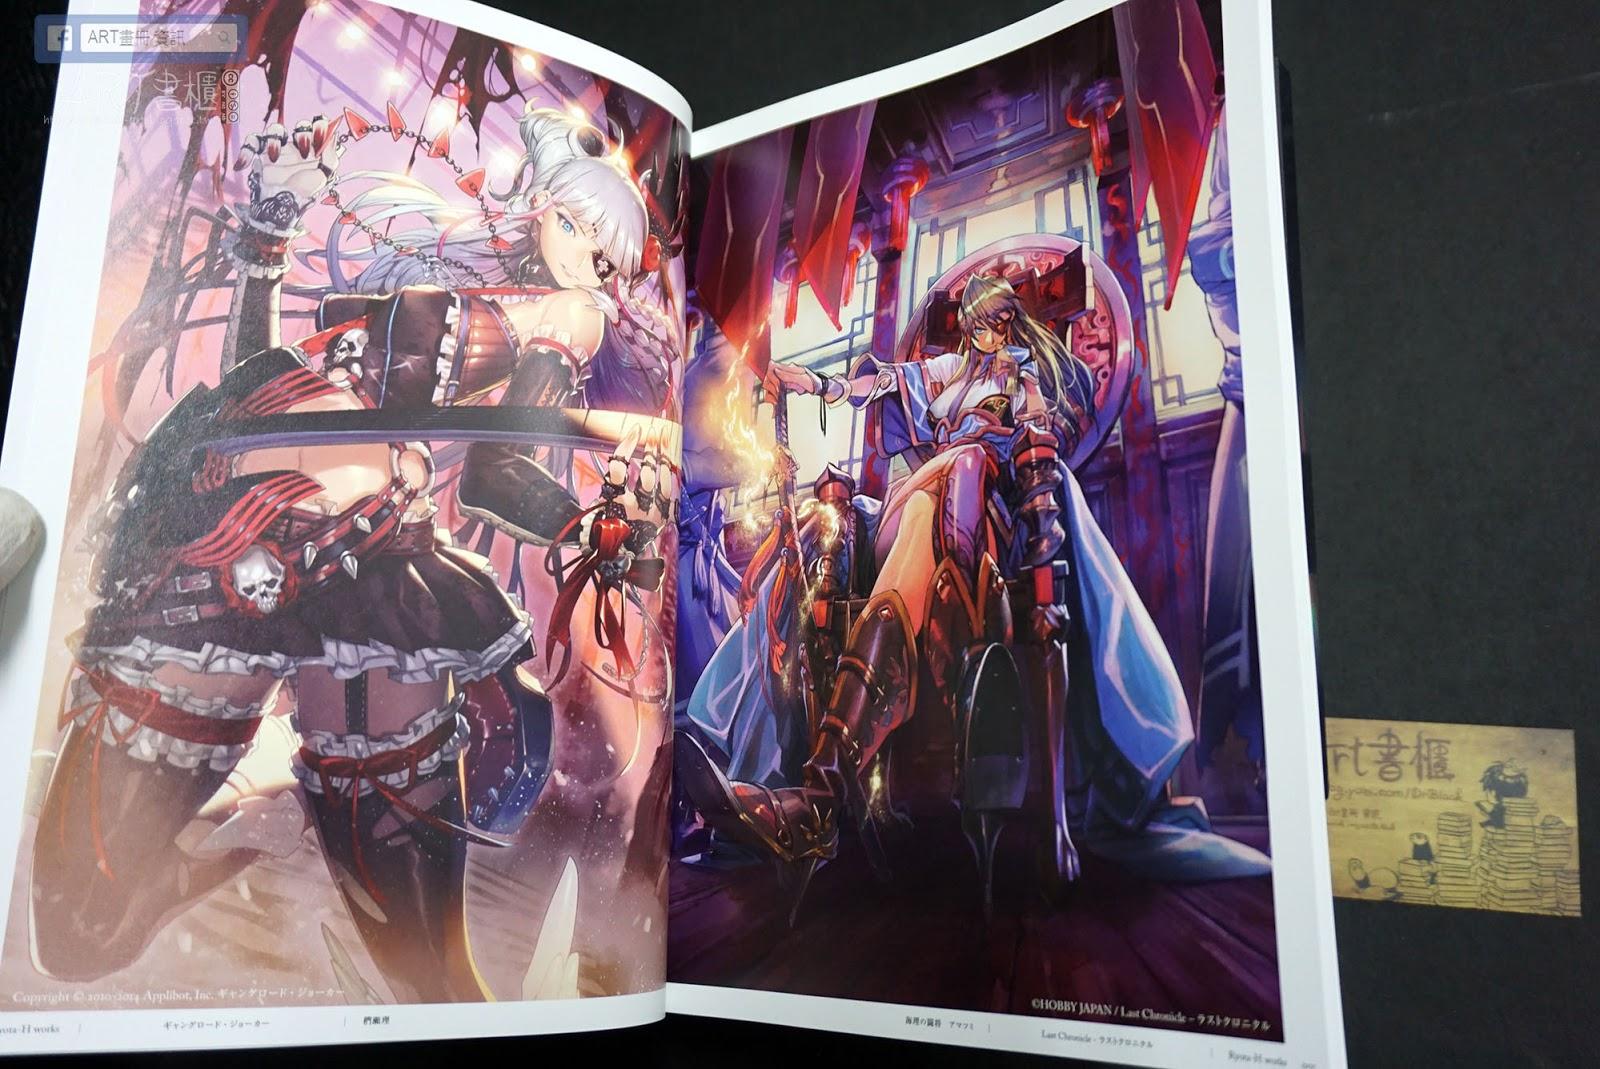 ART書櫃 Book Review: Ryota-H Works Ryota-H個人作品集